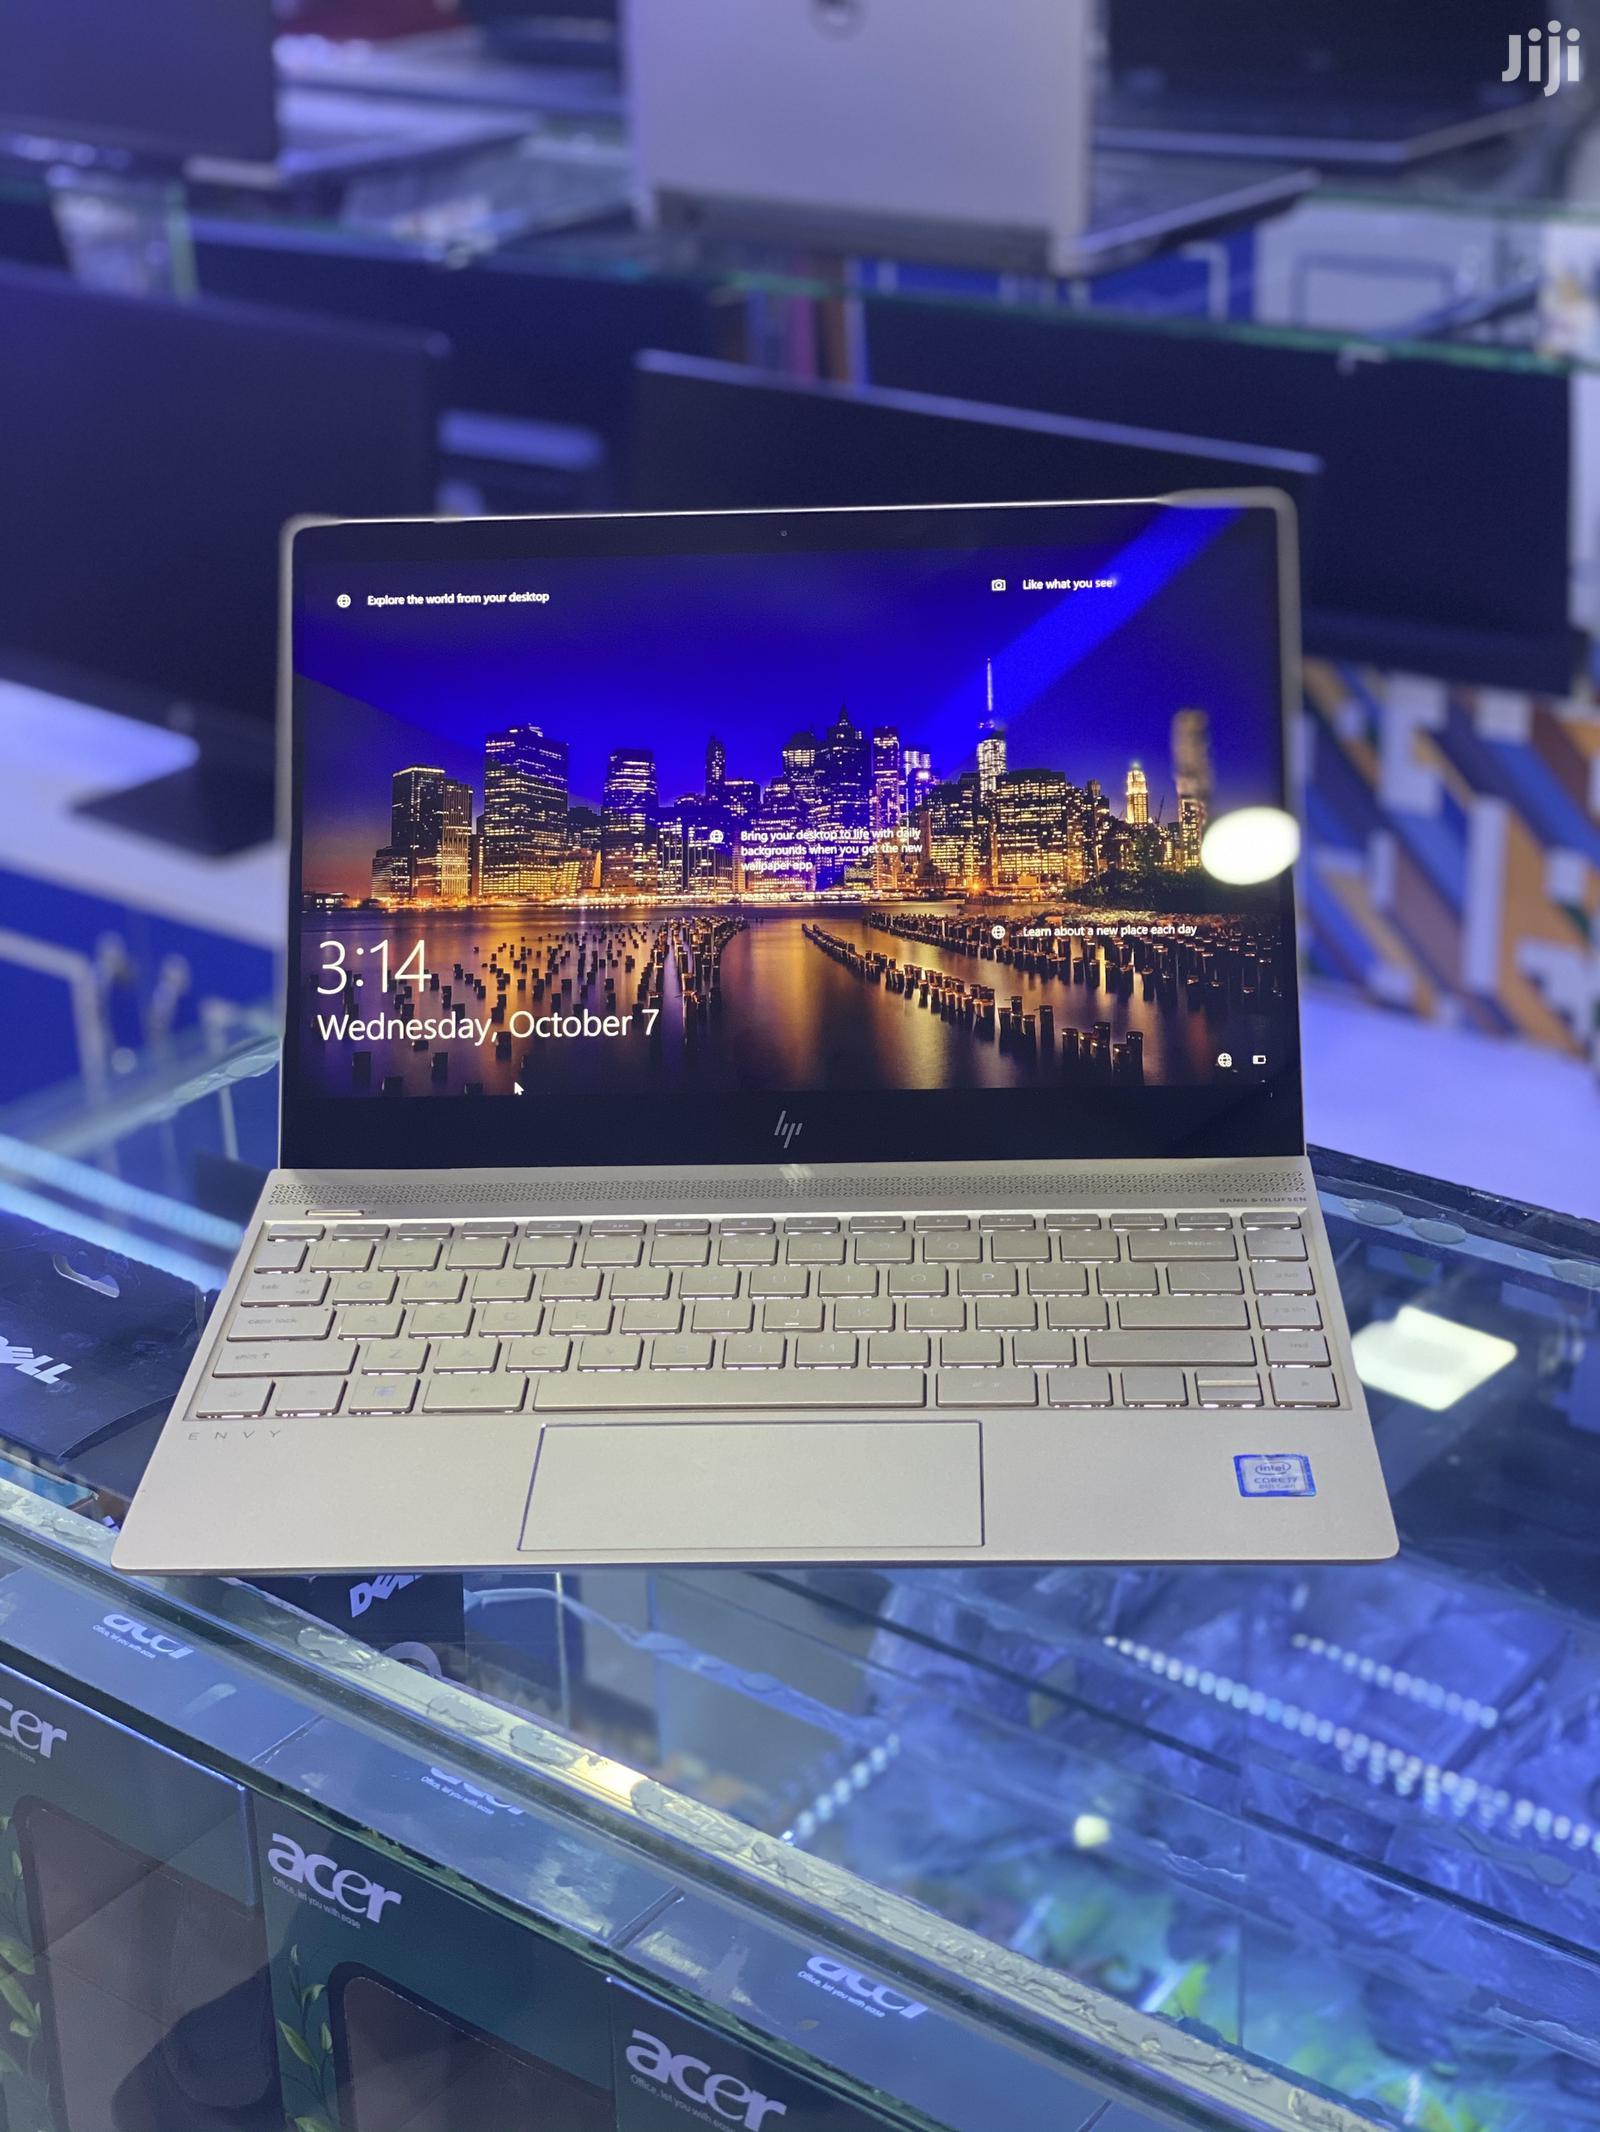 New Laptop HP EliteBook 840 G6 16GB Intel Core I7 SSHD (Hybrid) 320GB | Laptops & Computers for sale in Kampala, Central Region, Uganda